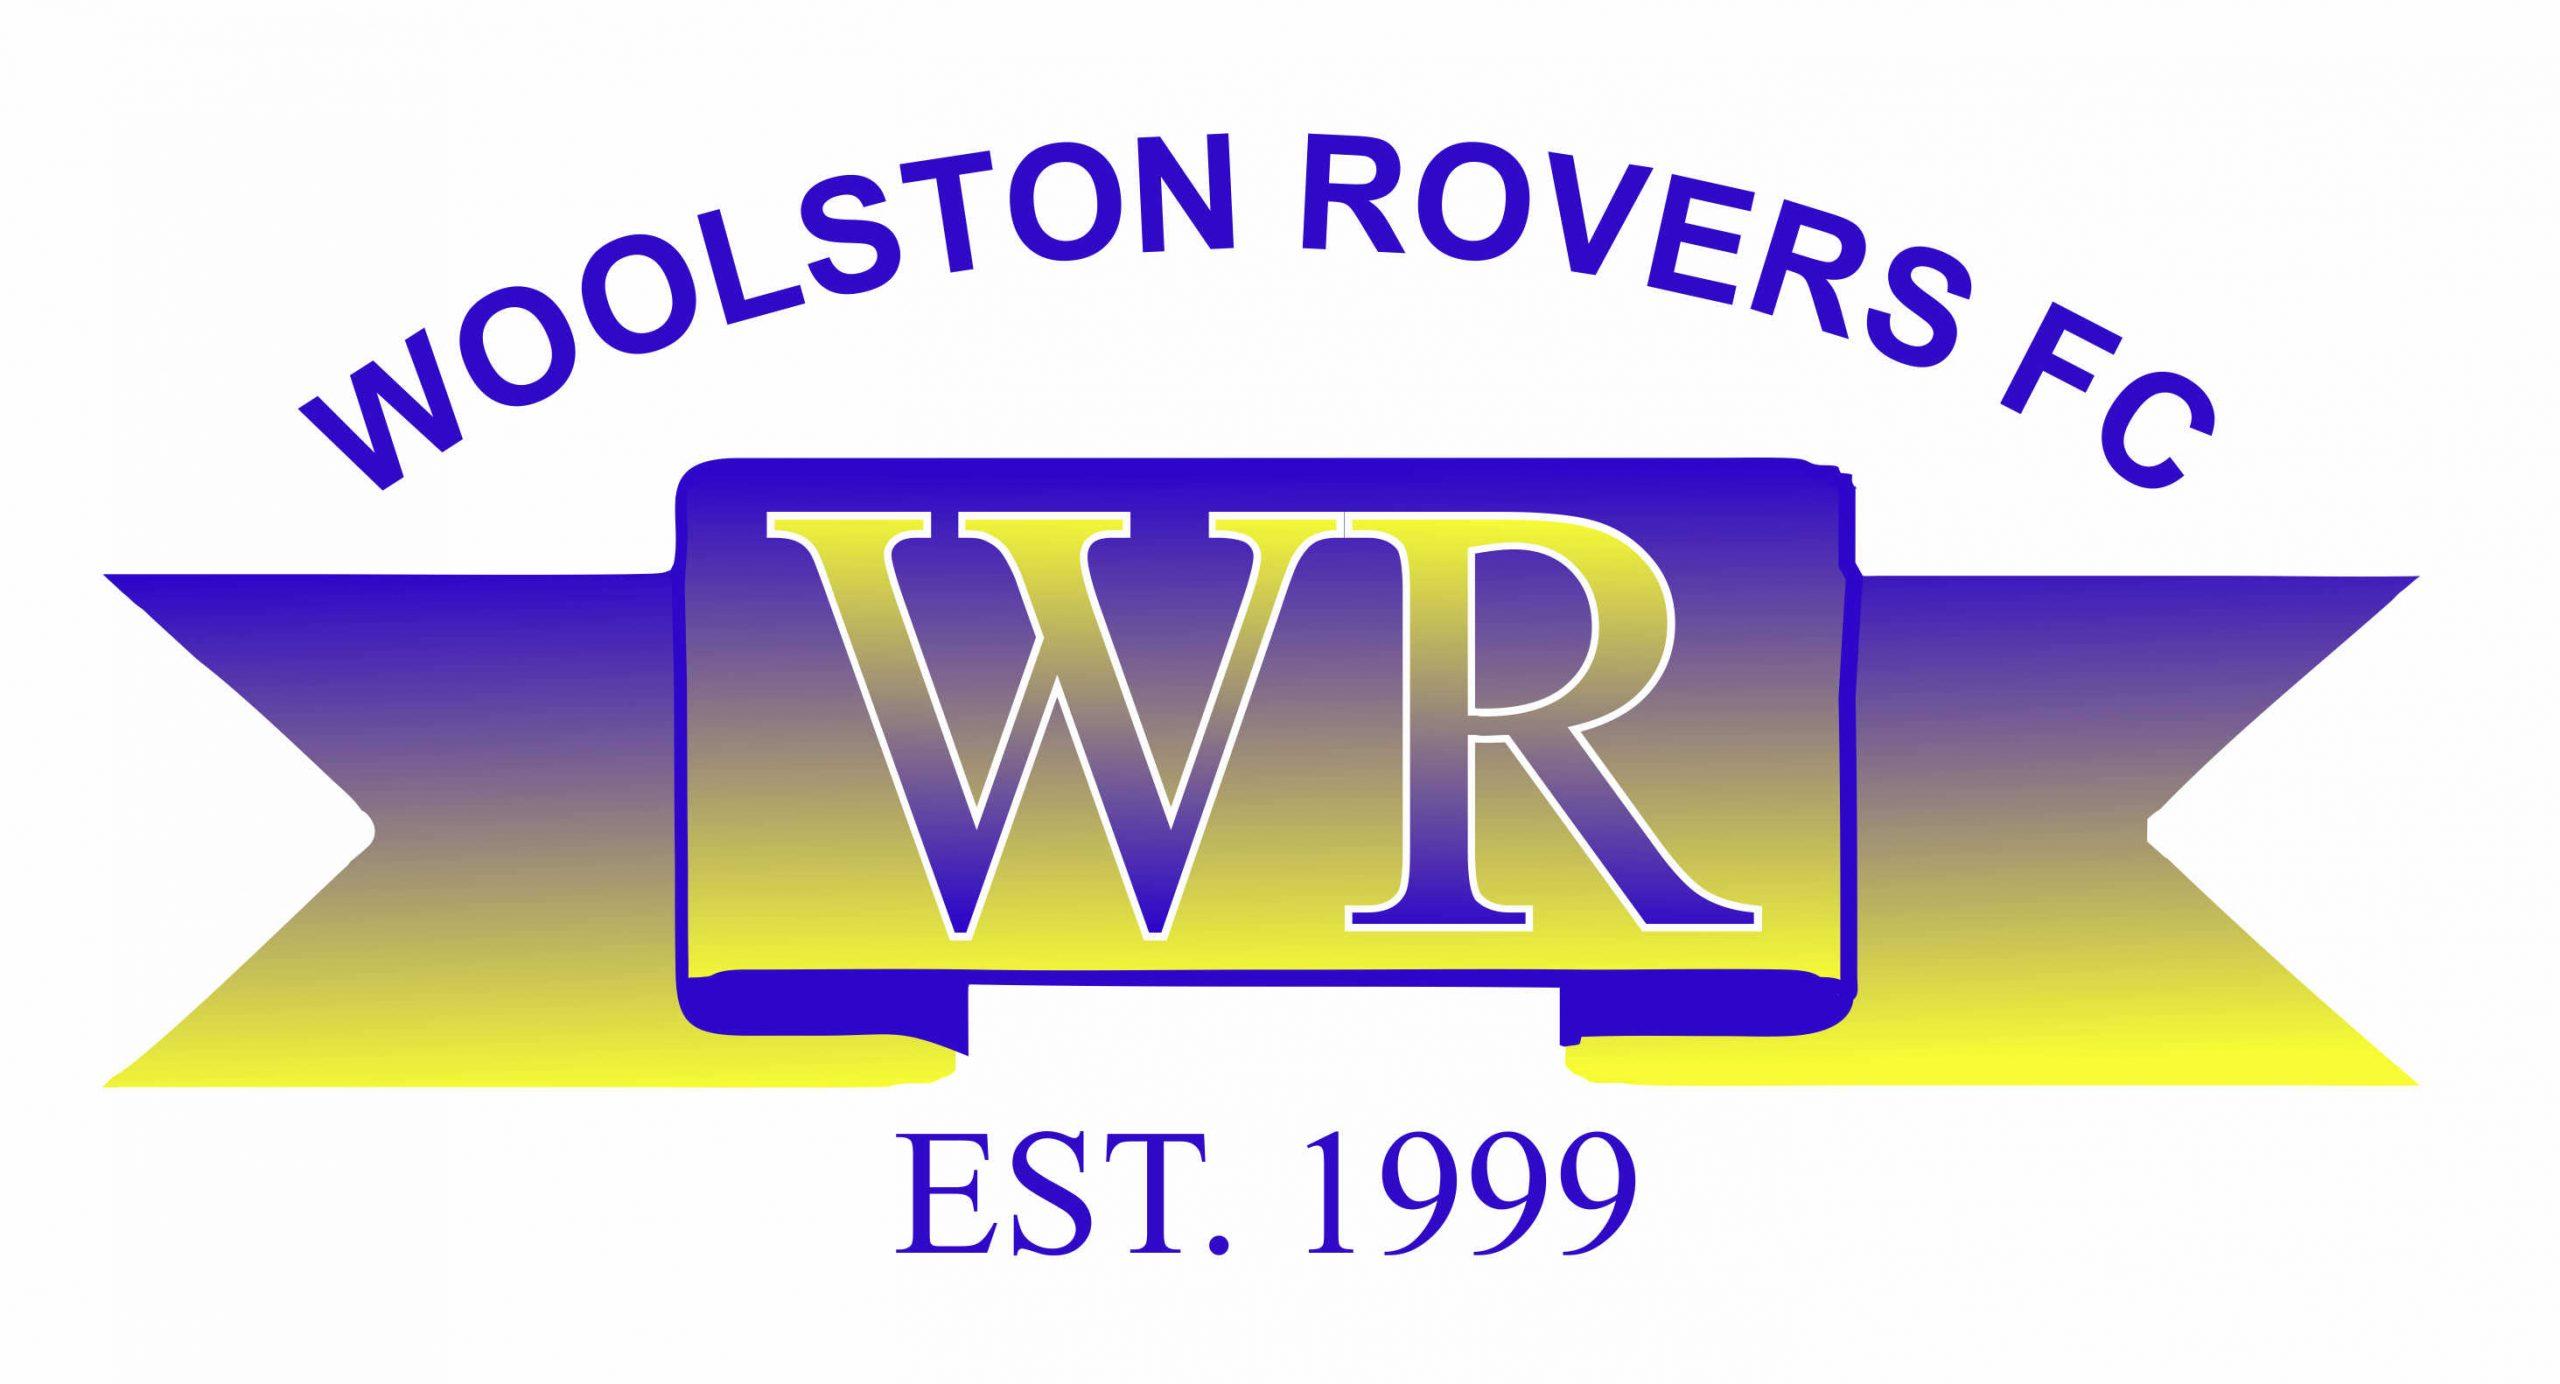 Woolston Rovers FC